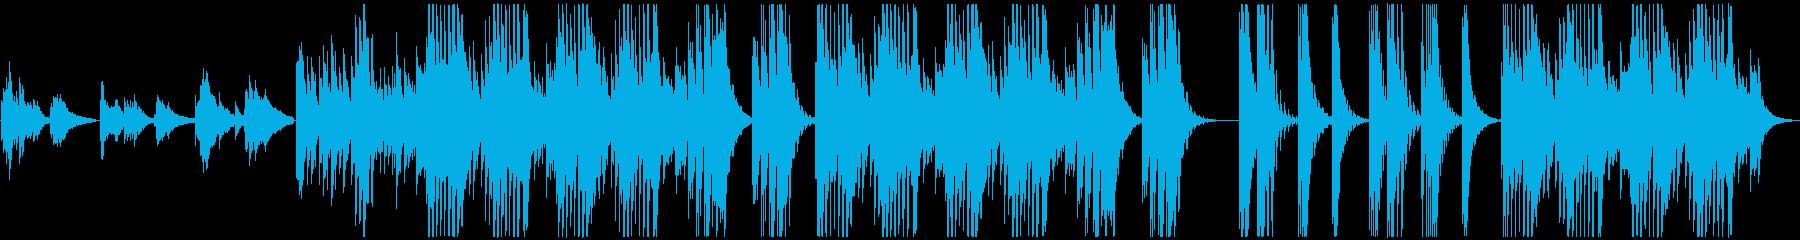 Pianoforte Solo。ス...の再生済みの波形